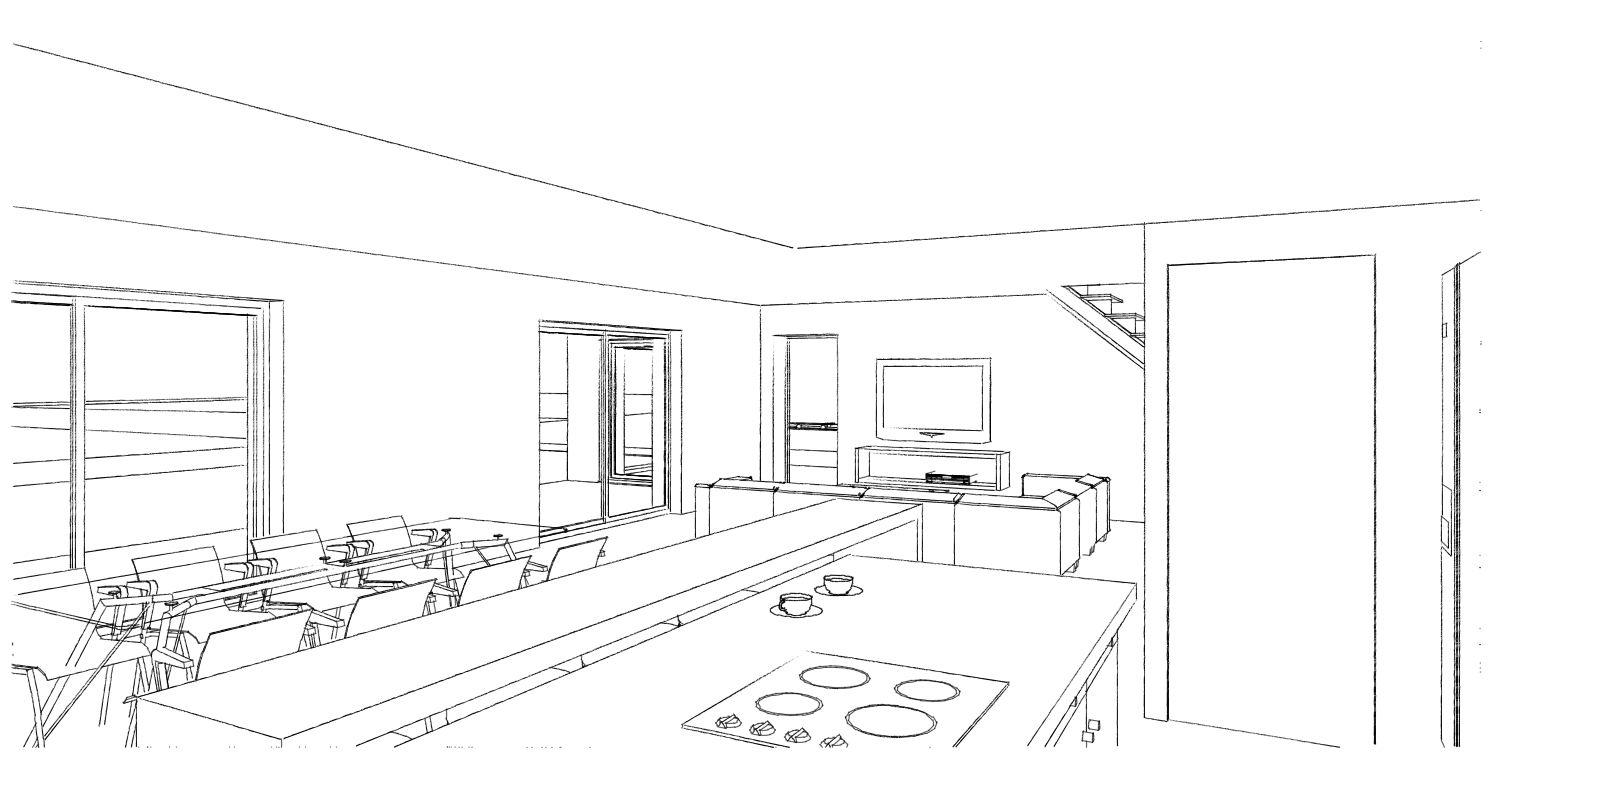 permis de construire architecte Lille 16